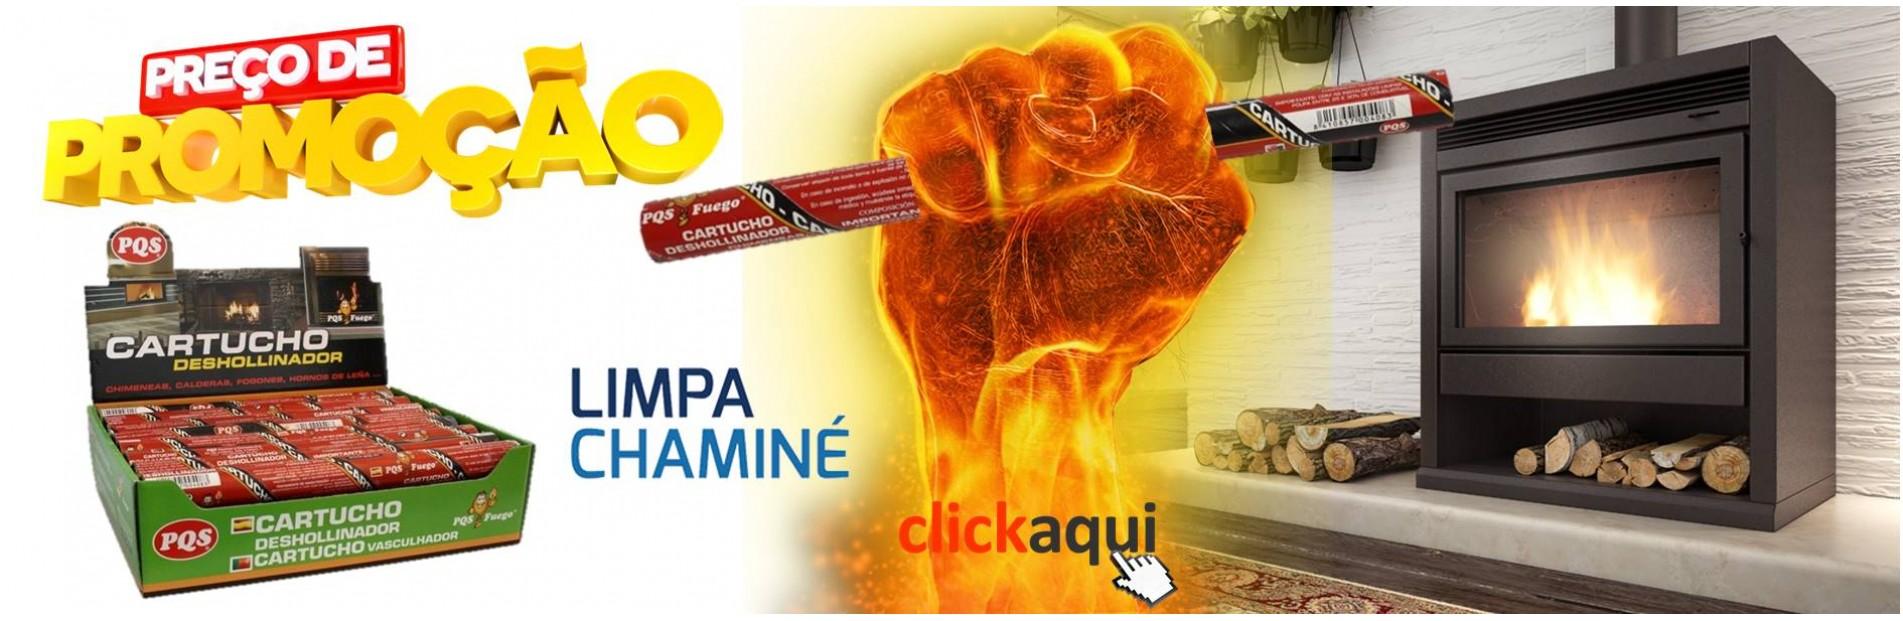 LIMPA CHAMINE